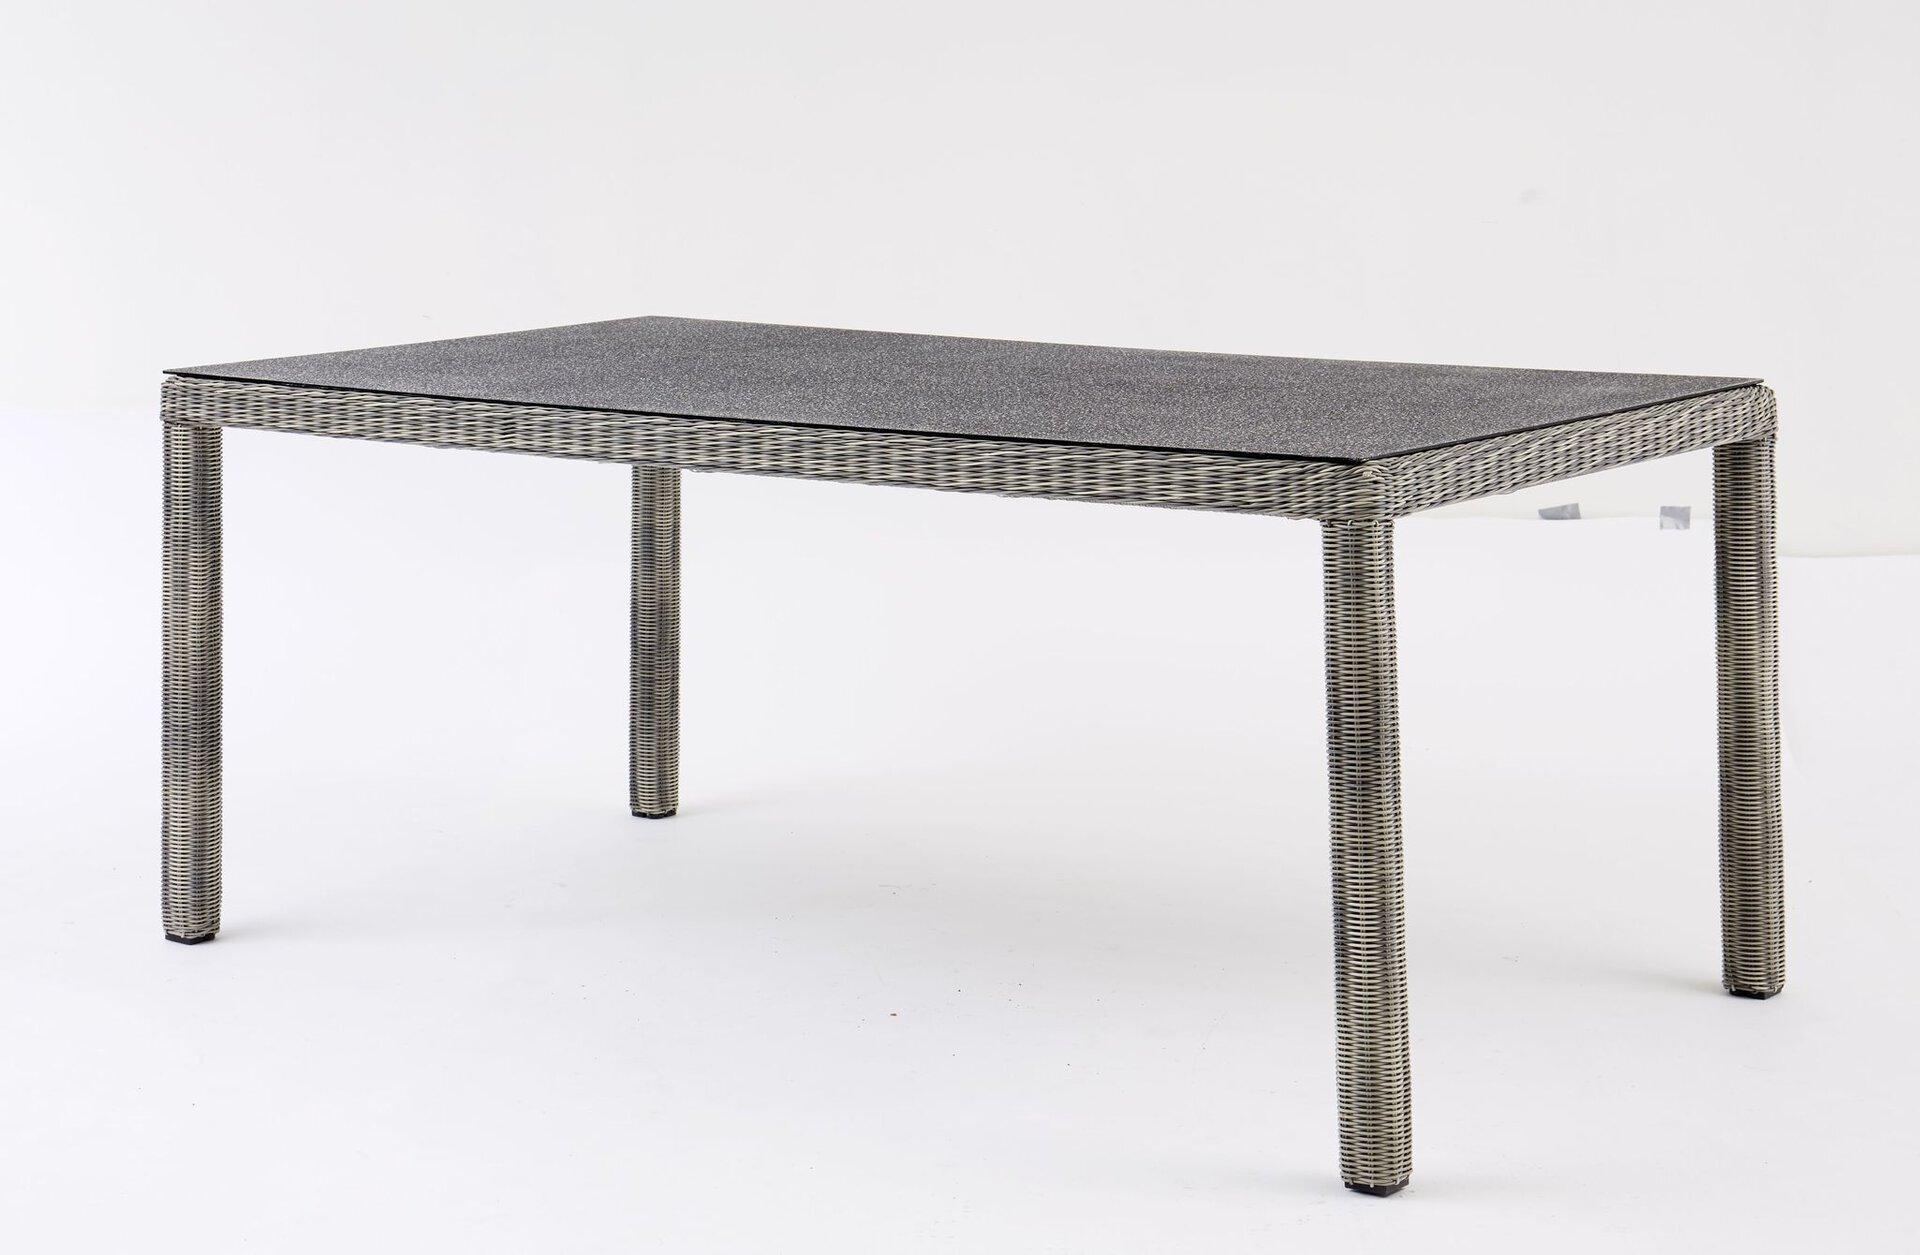 Gartenstuhl SMOKY III Outdoor Metall grau 62 x 92 x 64 cm